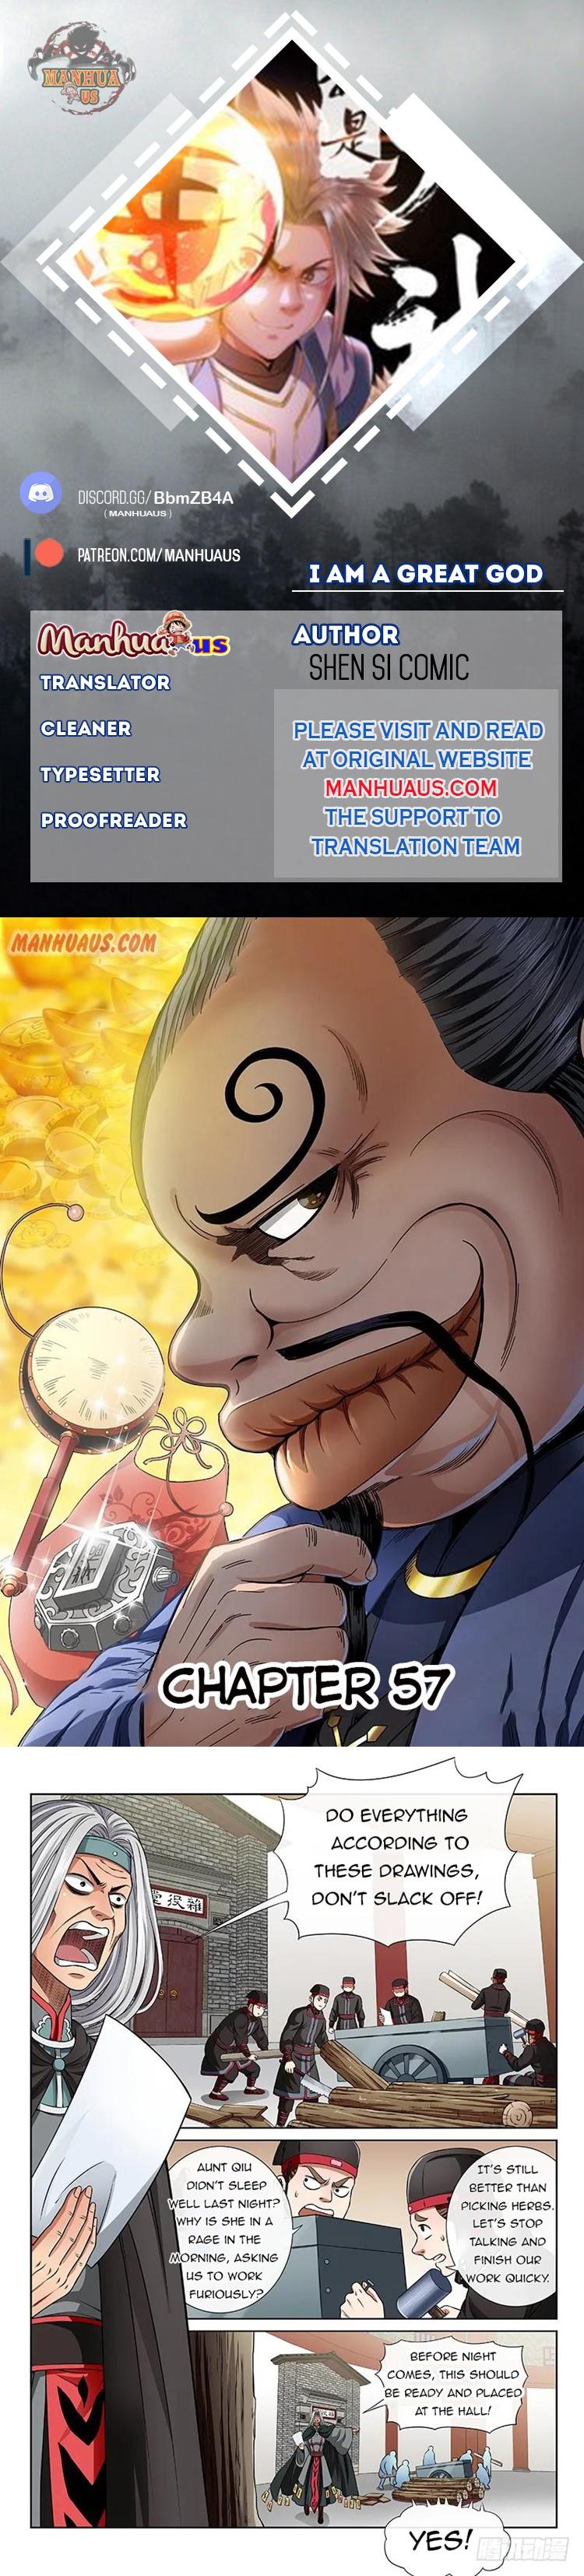 https://manga.mangadogs.com/comics/pic4/4/21124/2823088/e44e875c12109e4fa3716c05008048b2.jpg Page 1